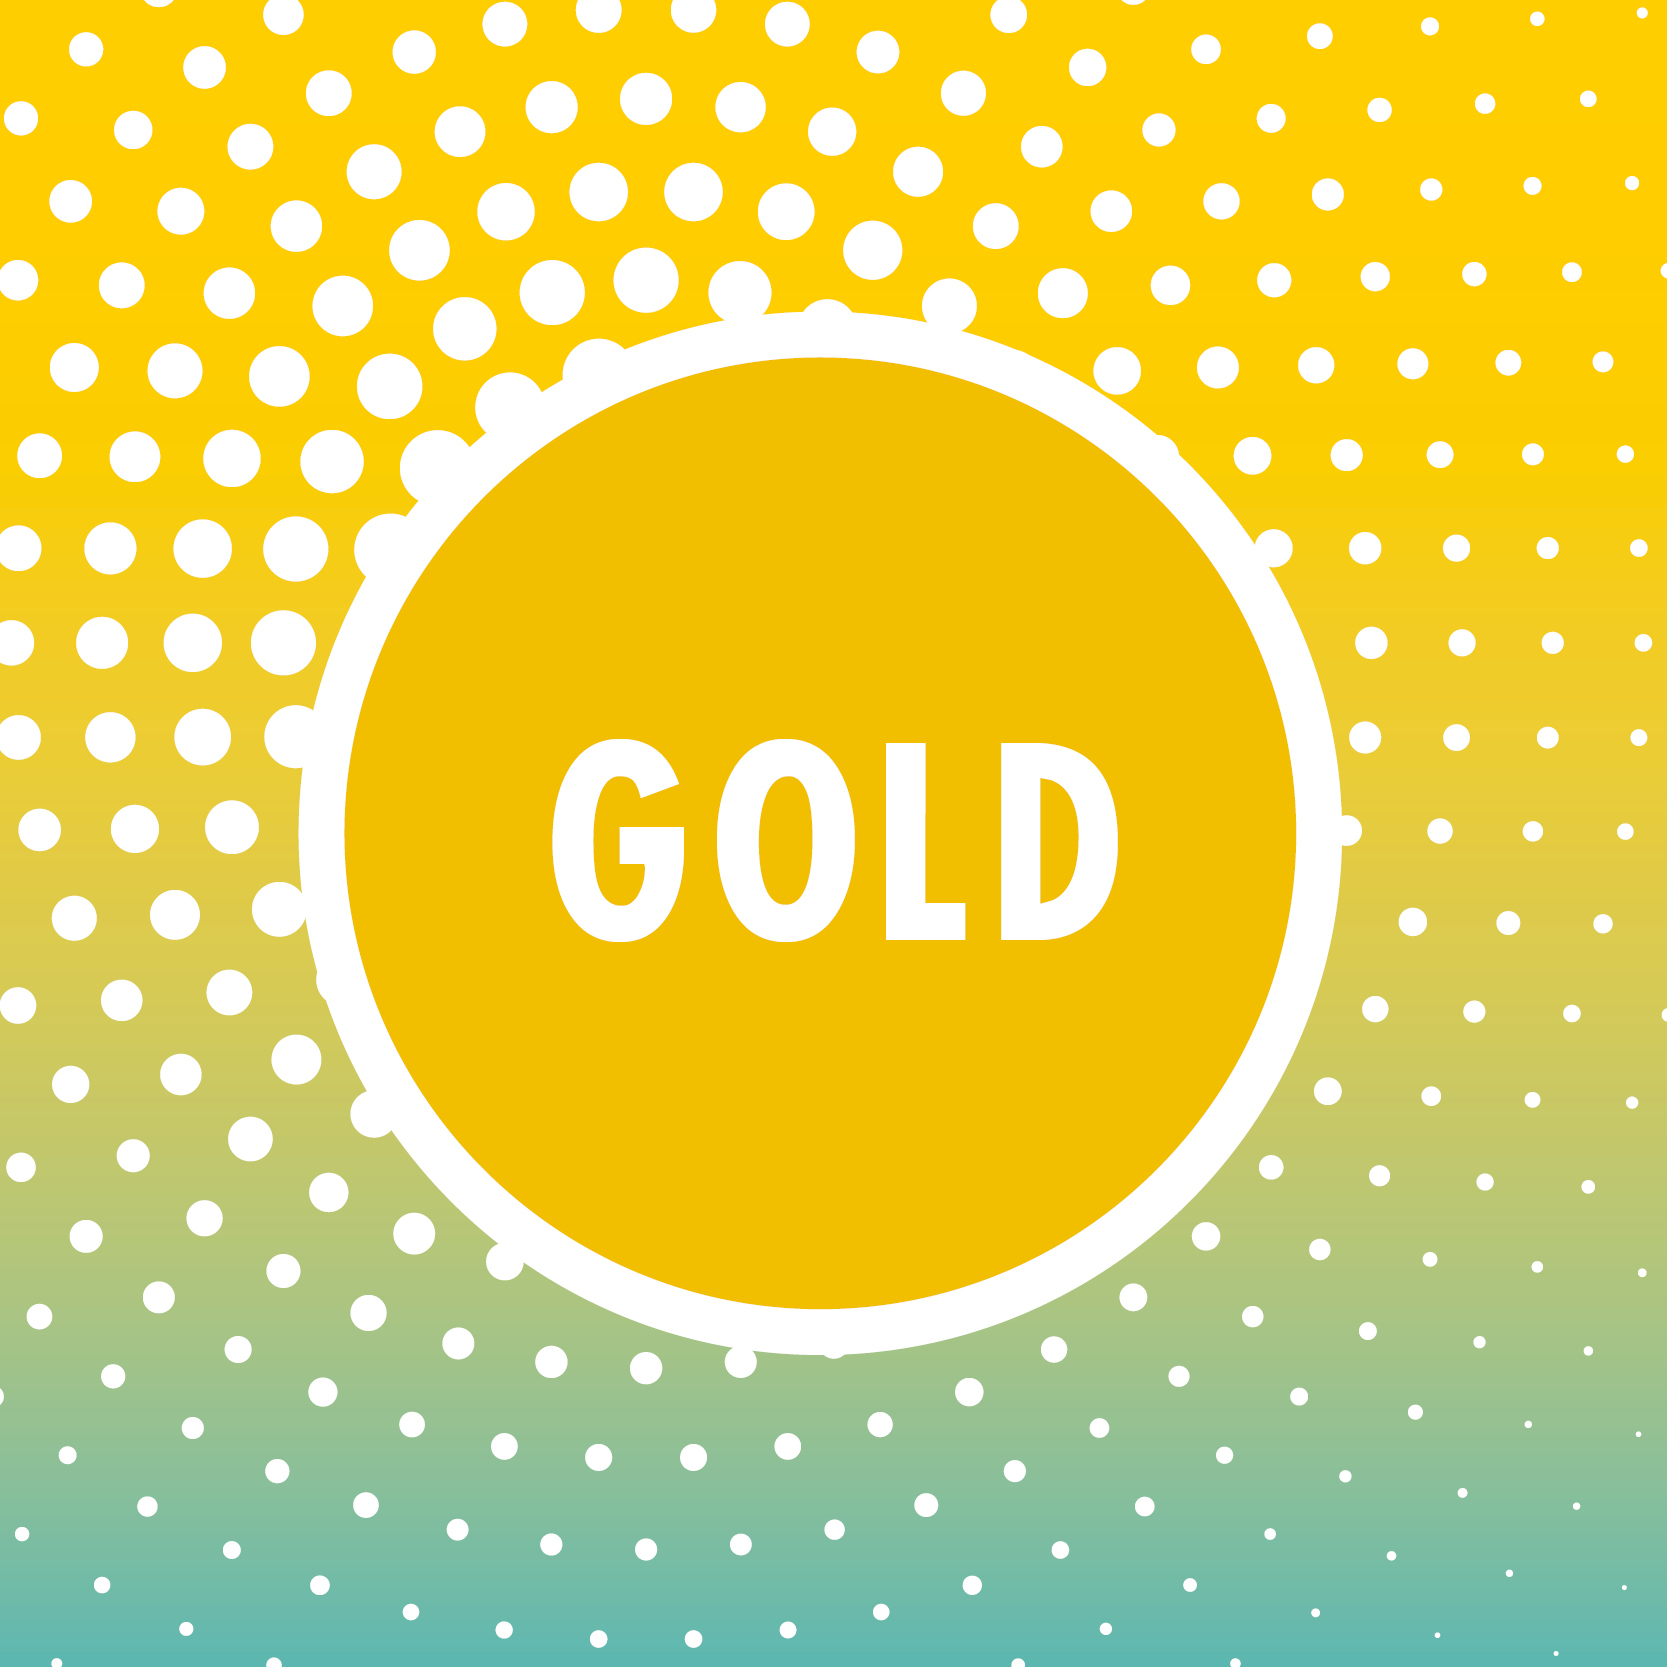 Solo_Gold.jpg